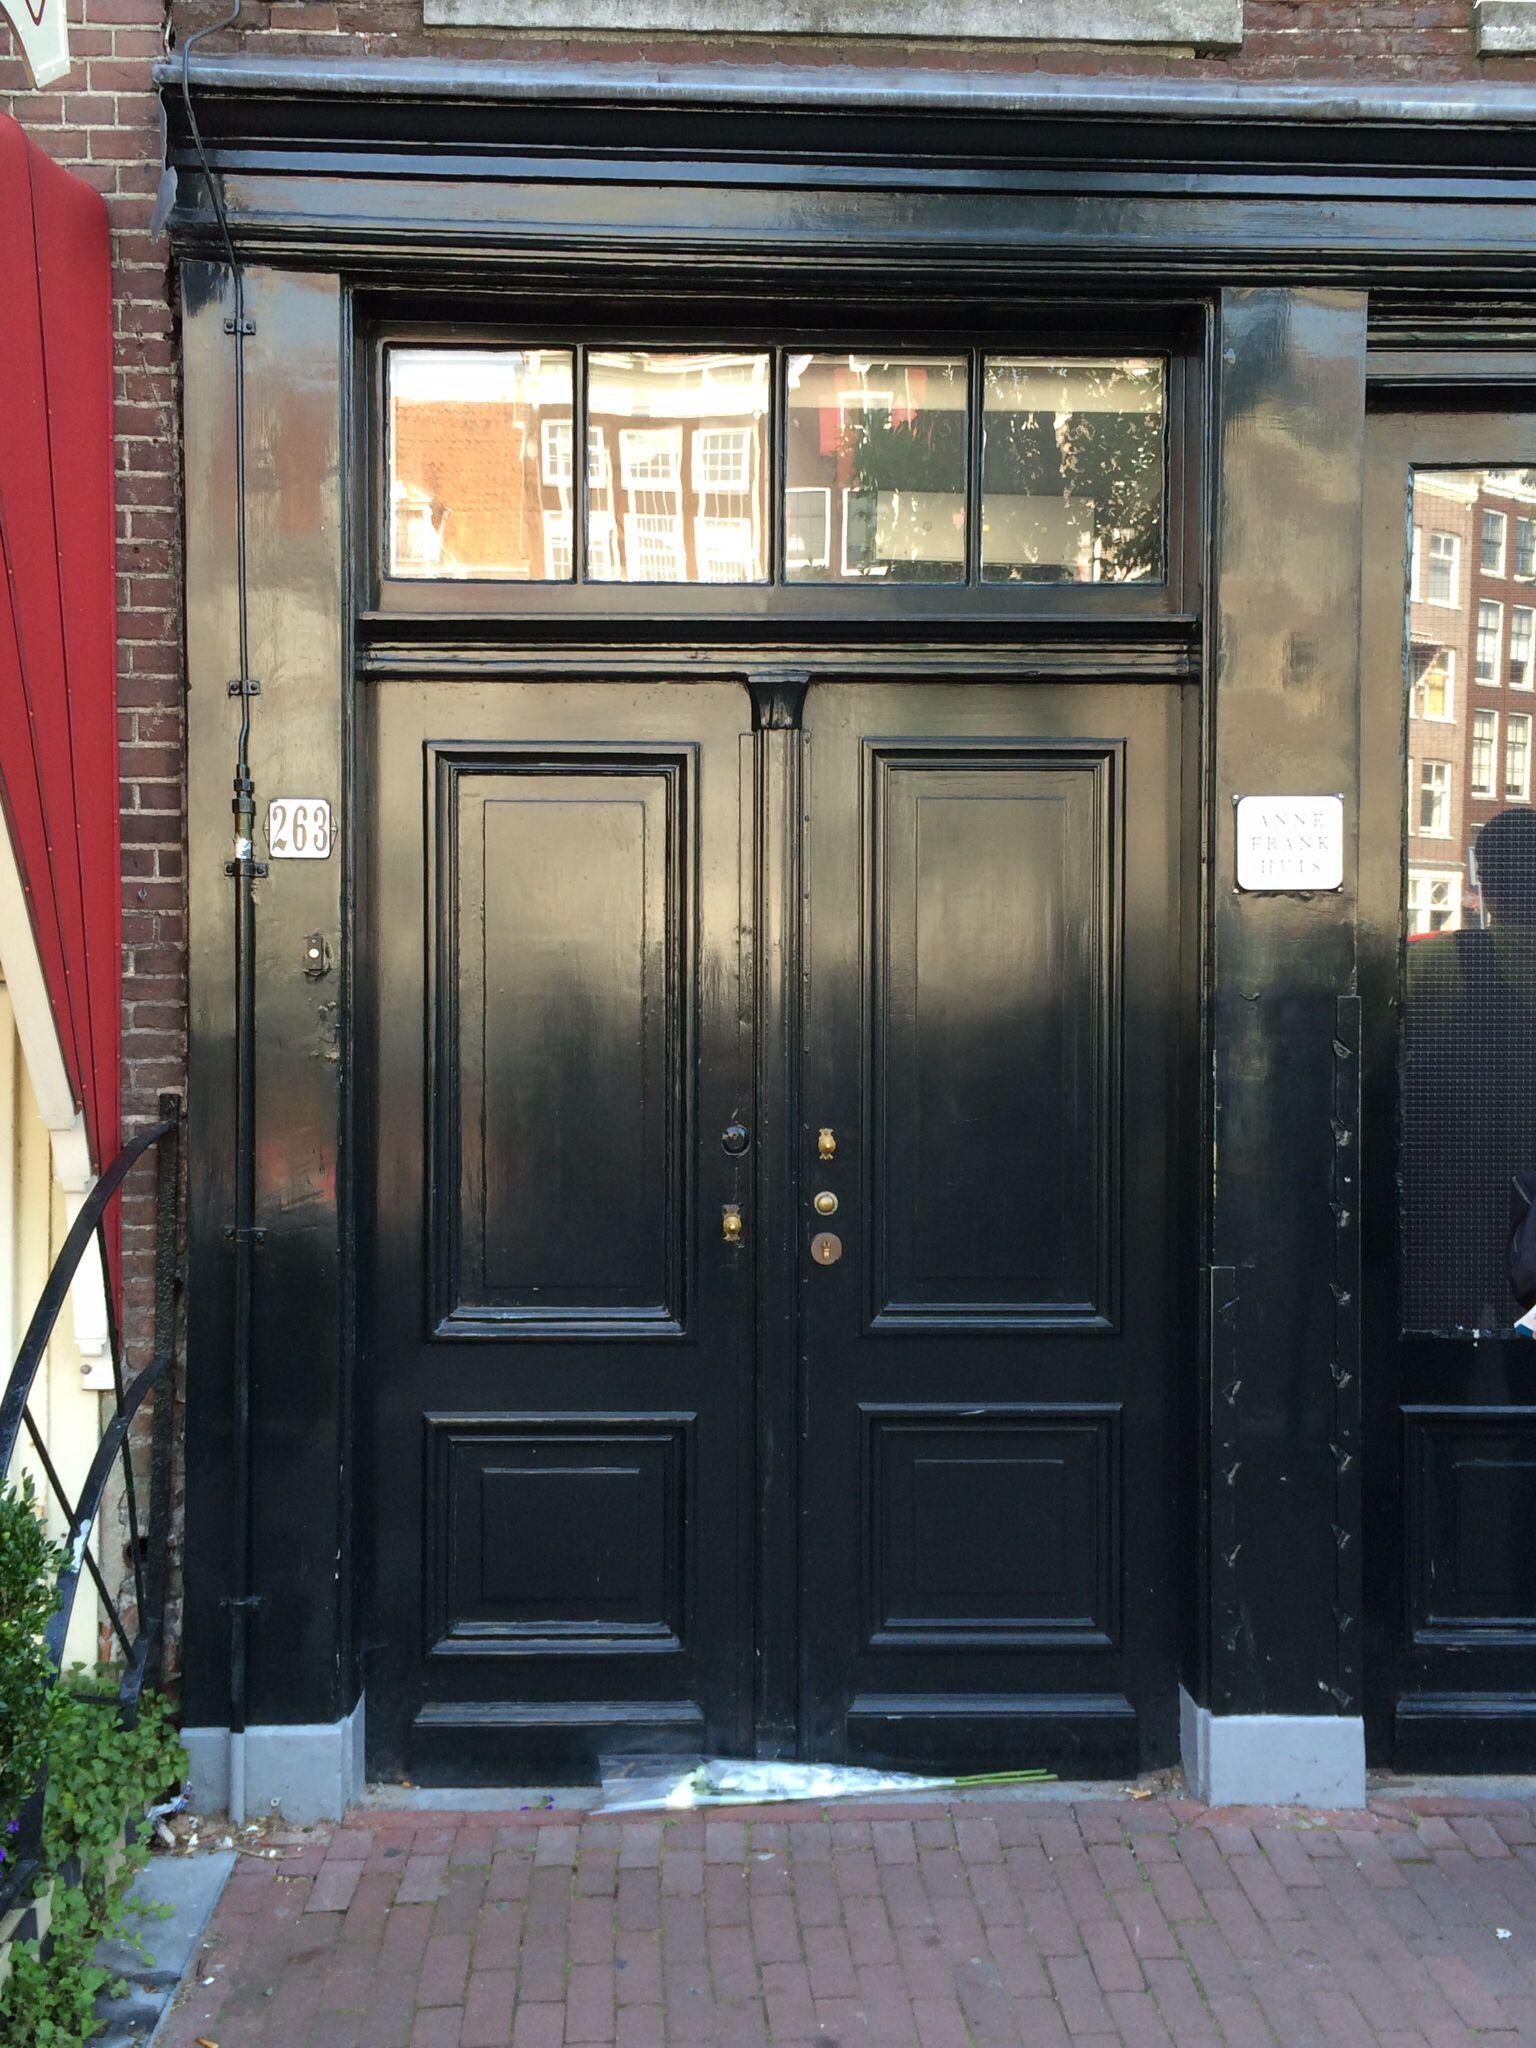 Front door of Anne Frank House on 263 Prinsengracht #netherlands #holland #amsterdam # & Front door of Anne Frank House on 263 Prinsengracht #netherlands ... Pezcame.Com